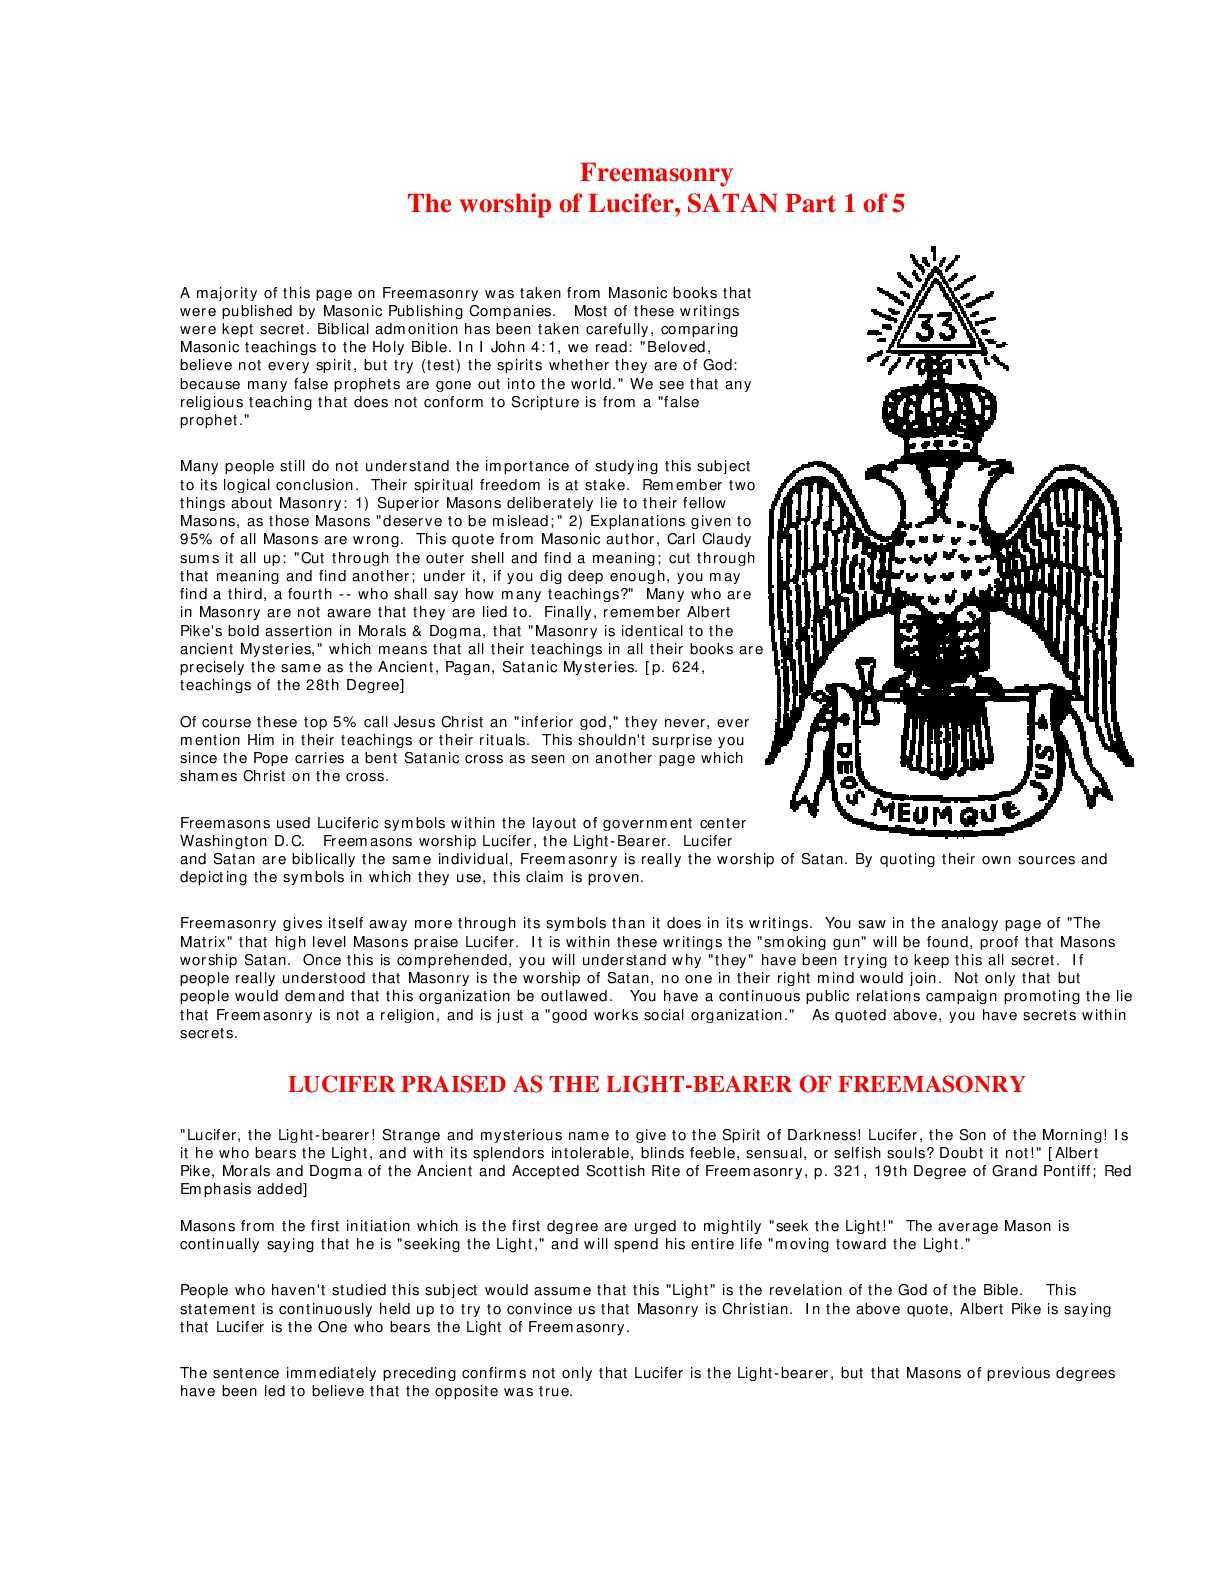 Calamo David Icke Freemasonssatanism And Symbolism